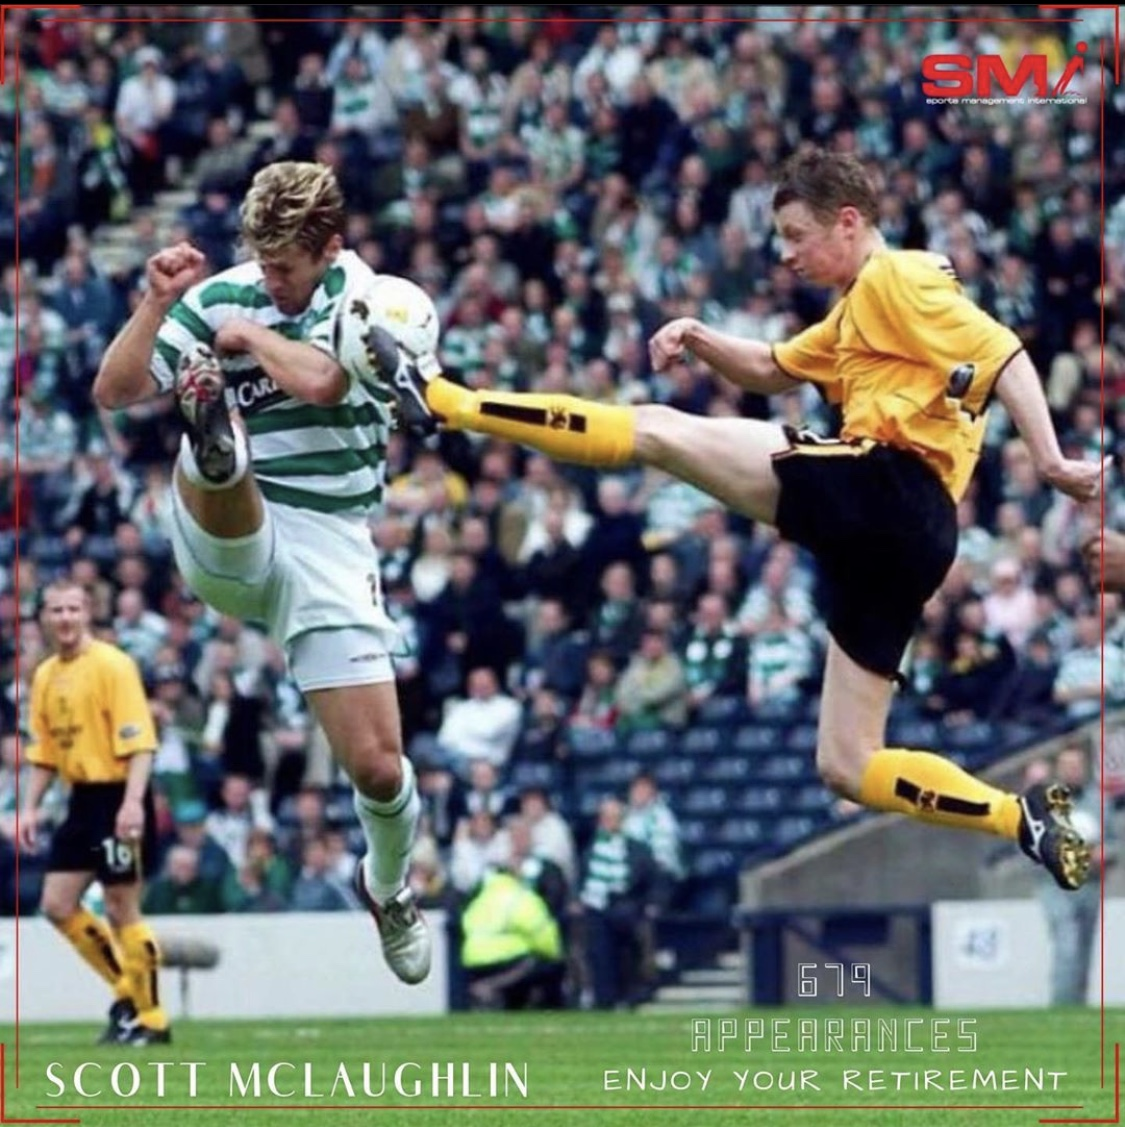 Scott McLaughlin retirement